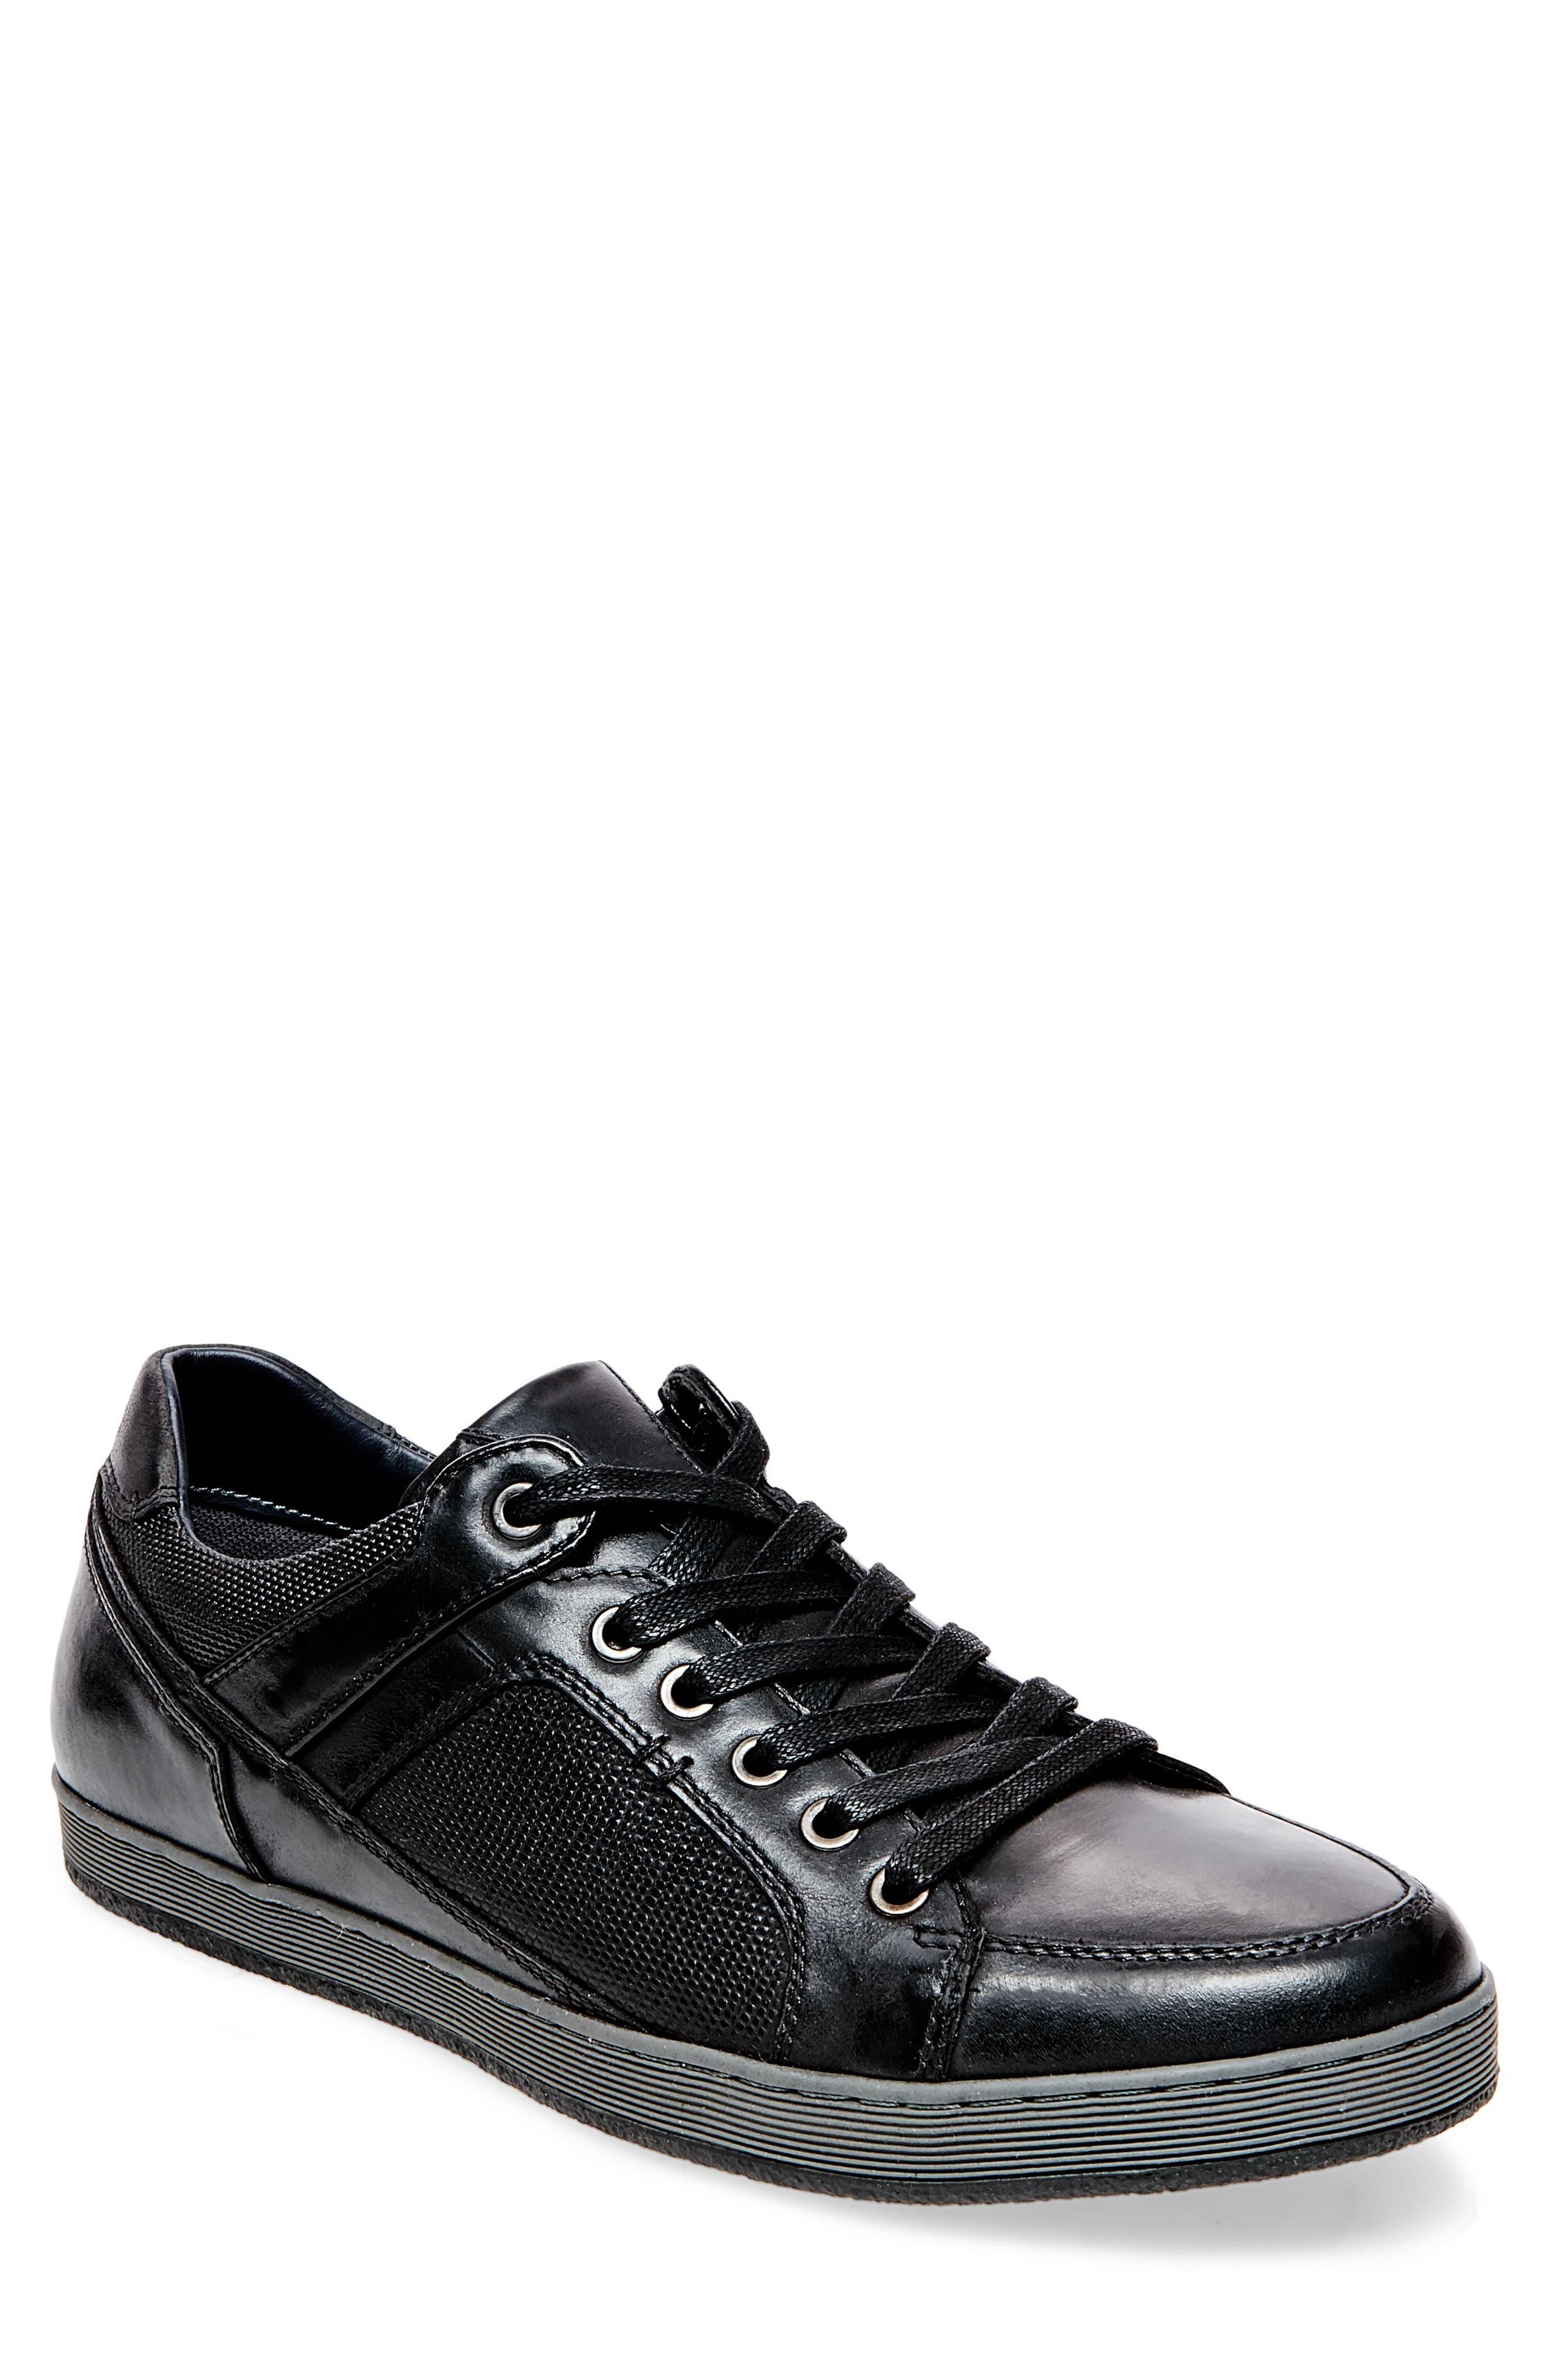 Palis Sneaker,                             Main thumbnail 1, color,                             017